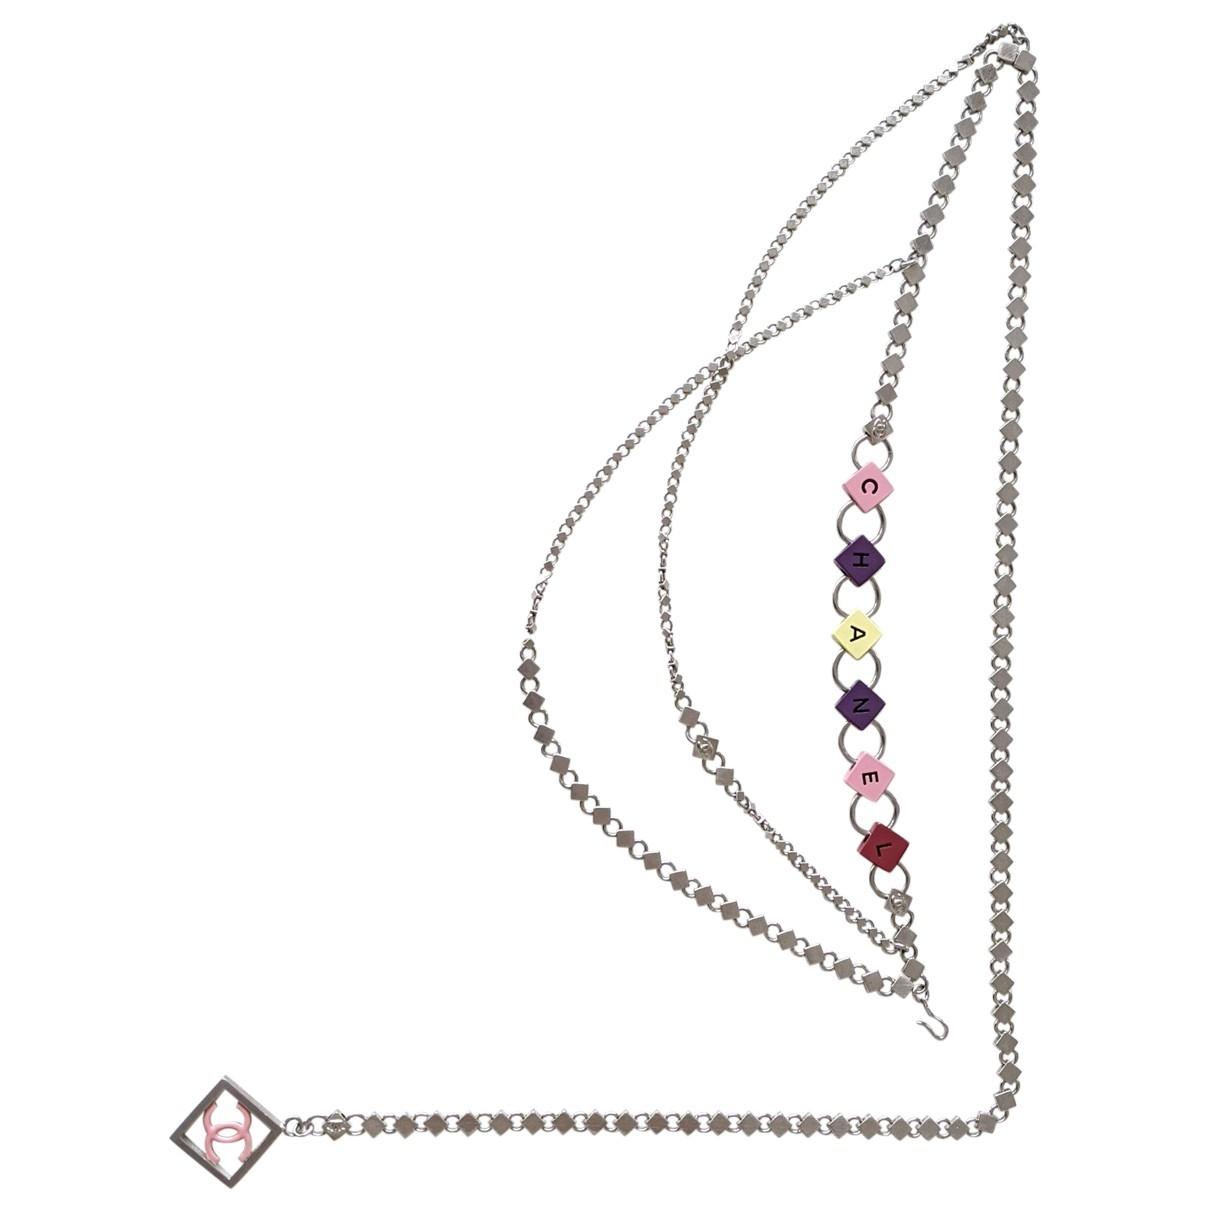 Chanel \N Multicolour Metal belt for Women M International